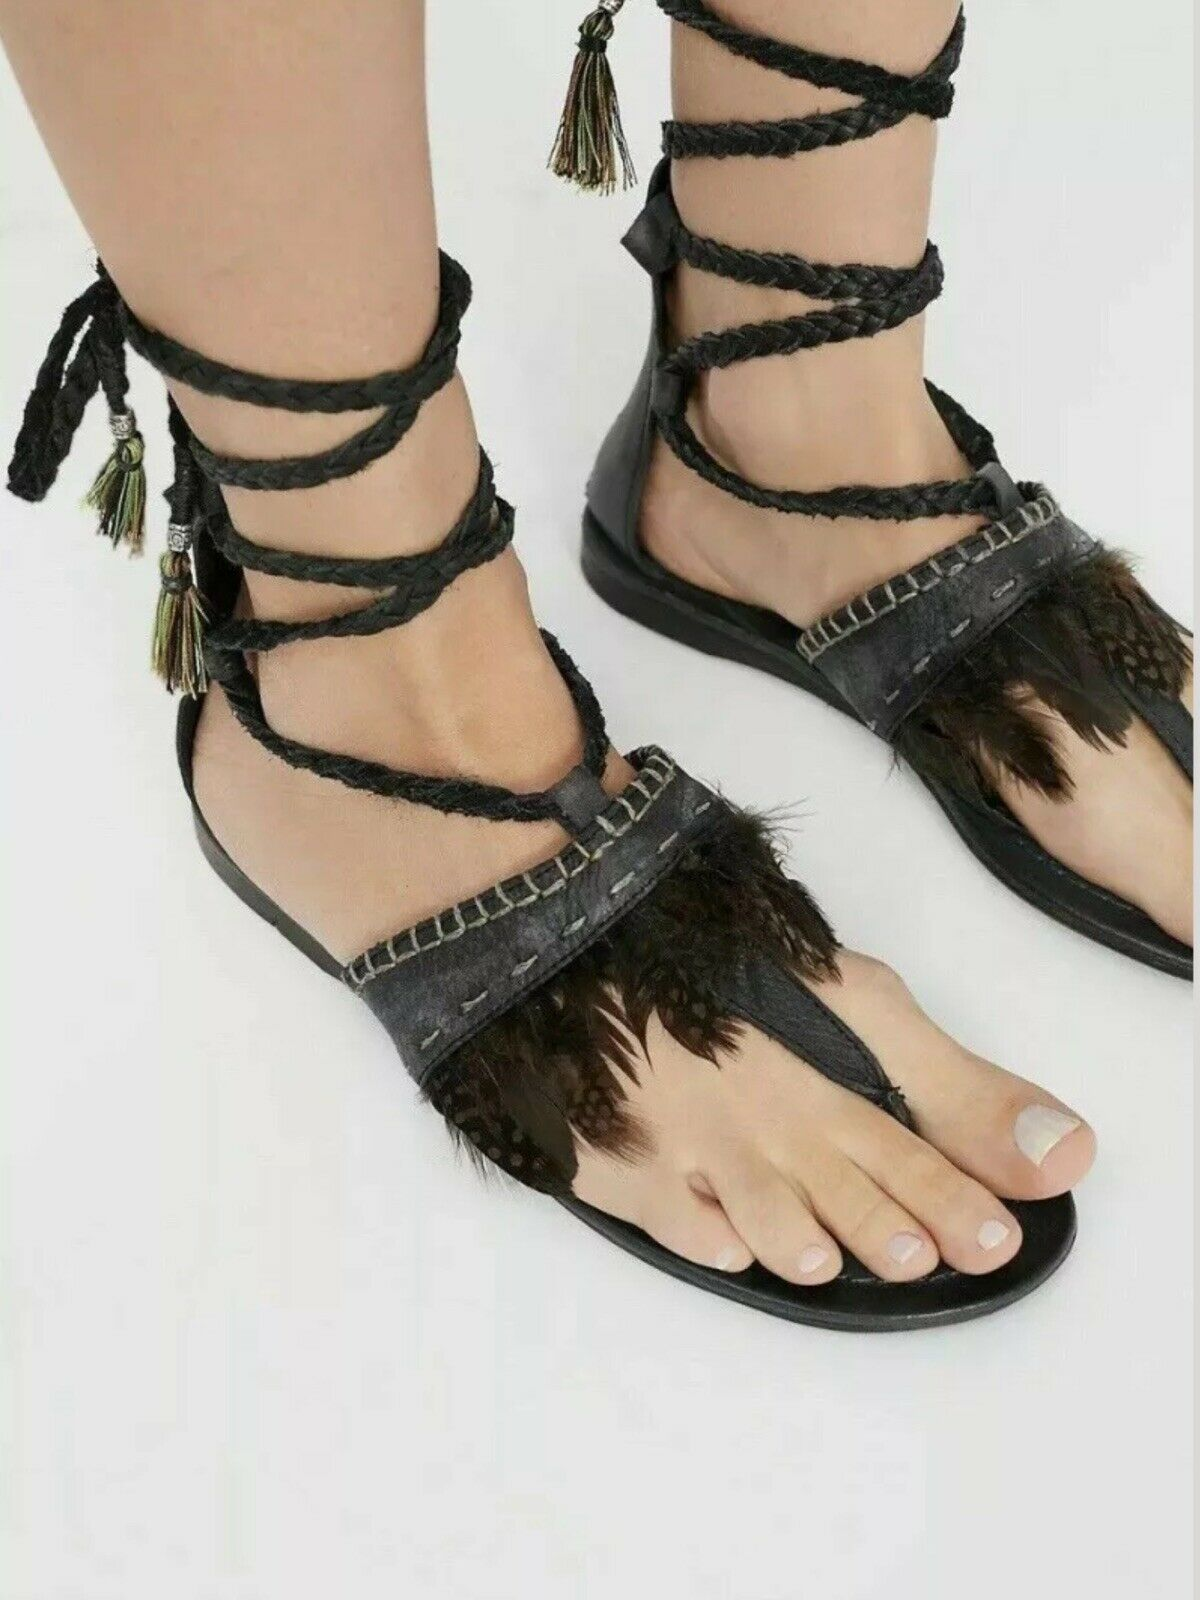 Free People Bora Bora Braided Black Wrap Sandals w Feathers  Size 37